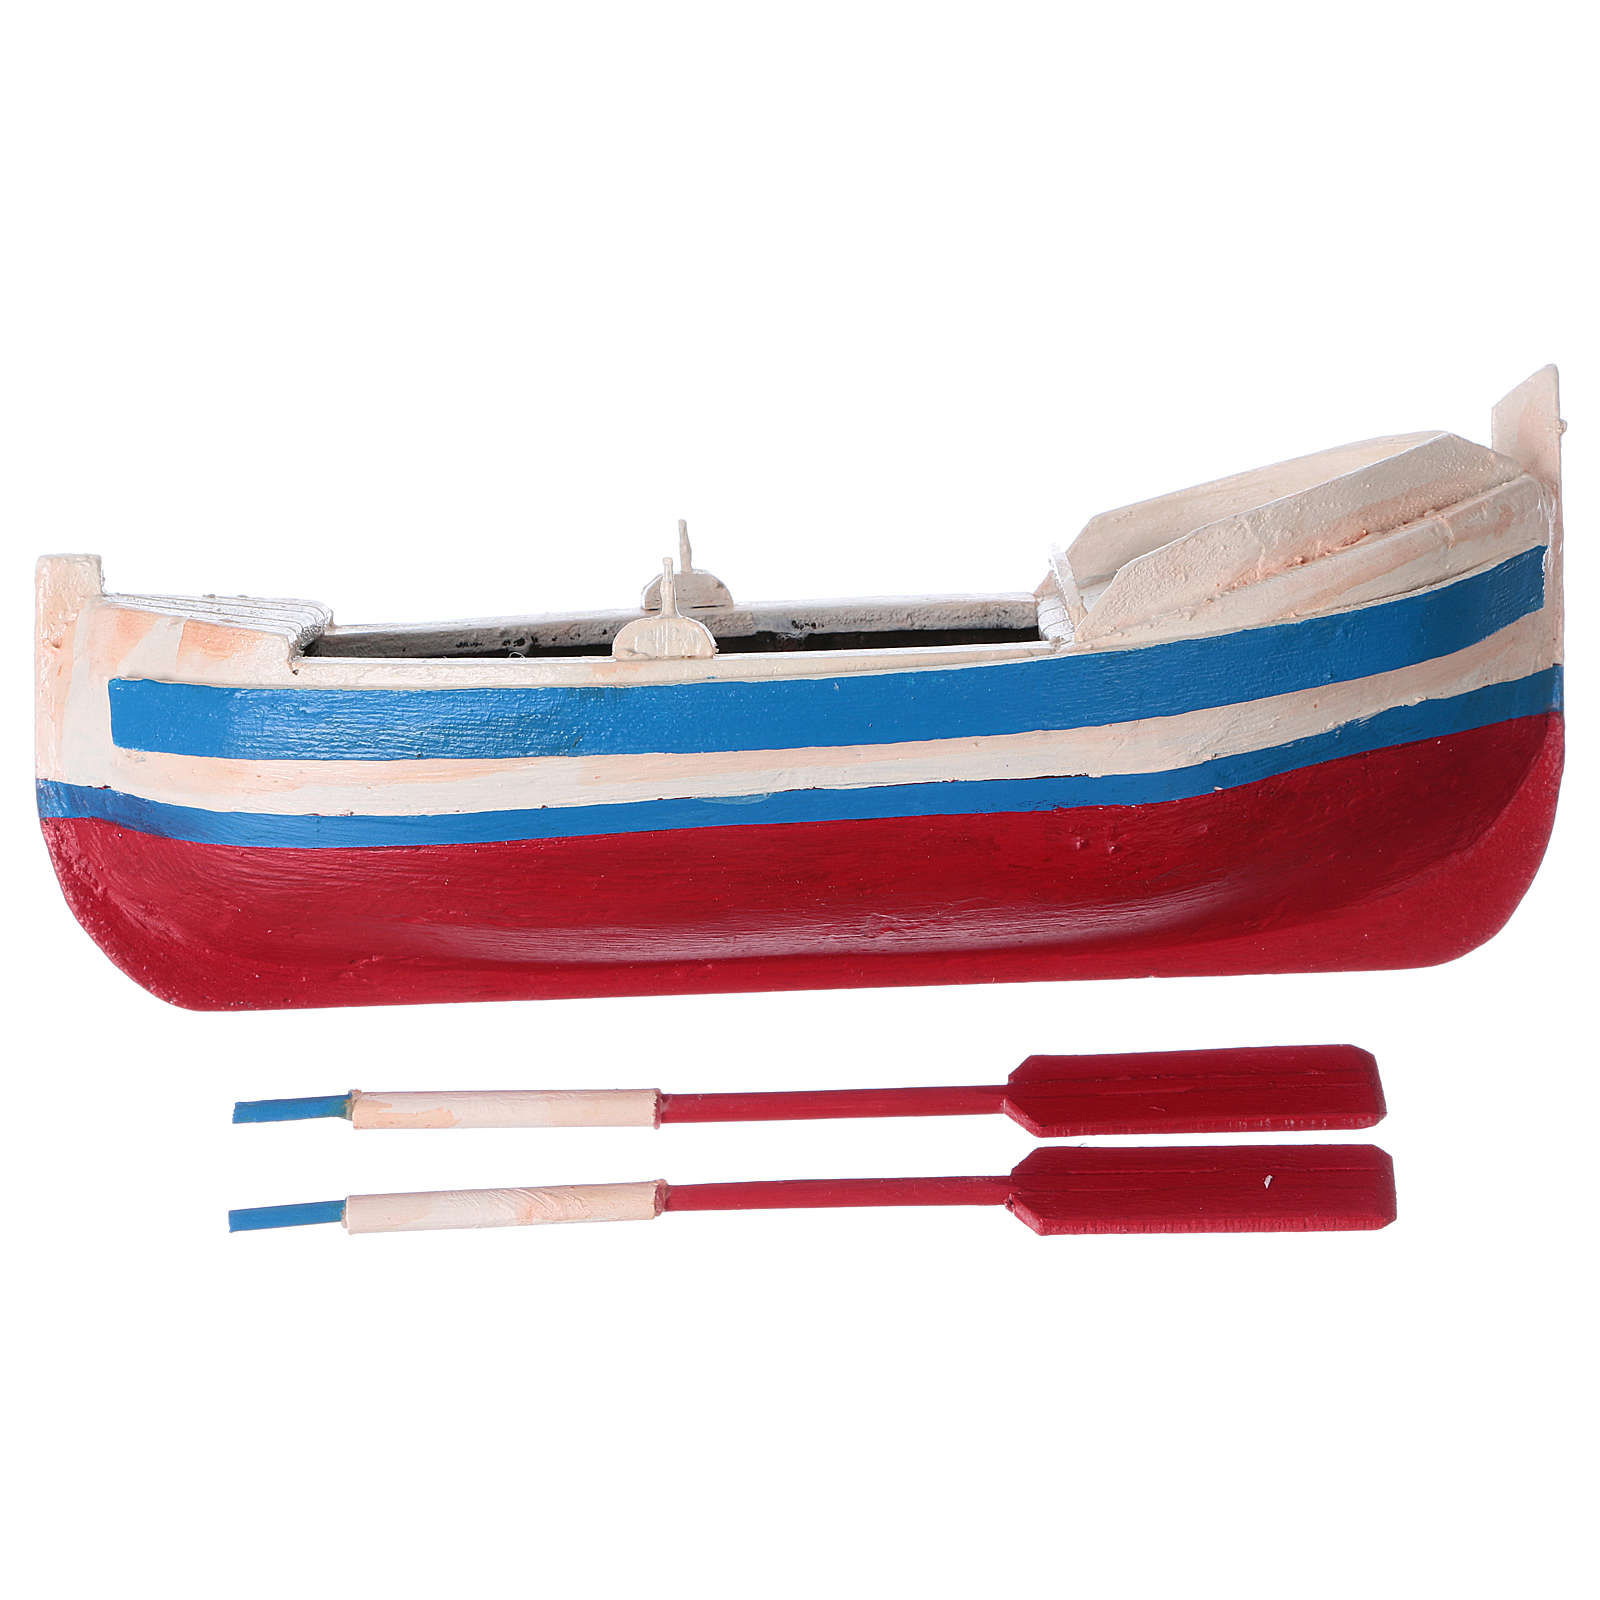 Barca gozzo presepe statuina 10 cm 4